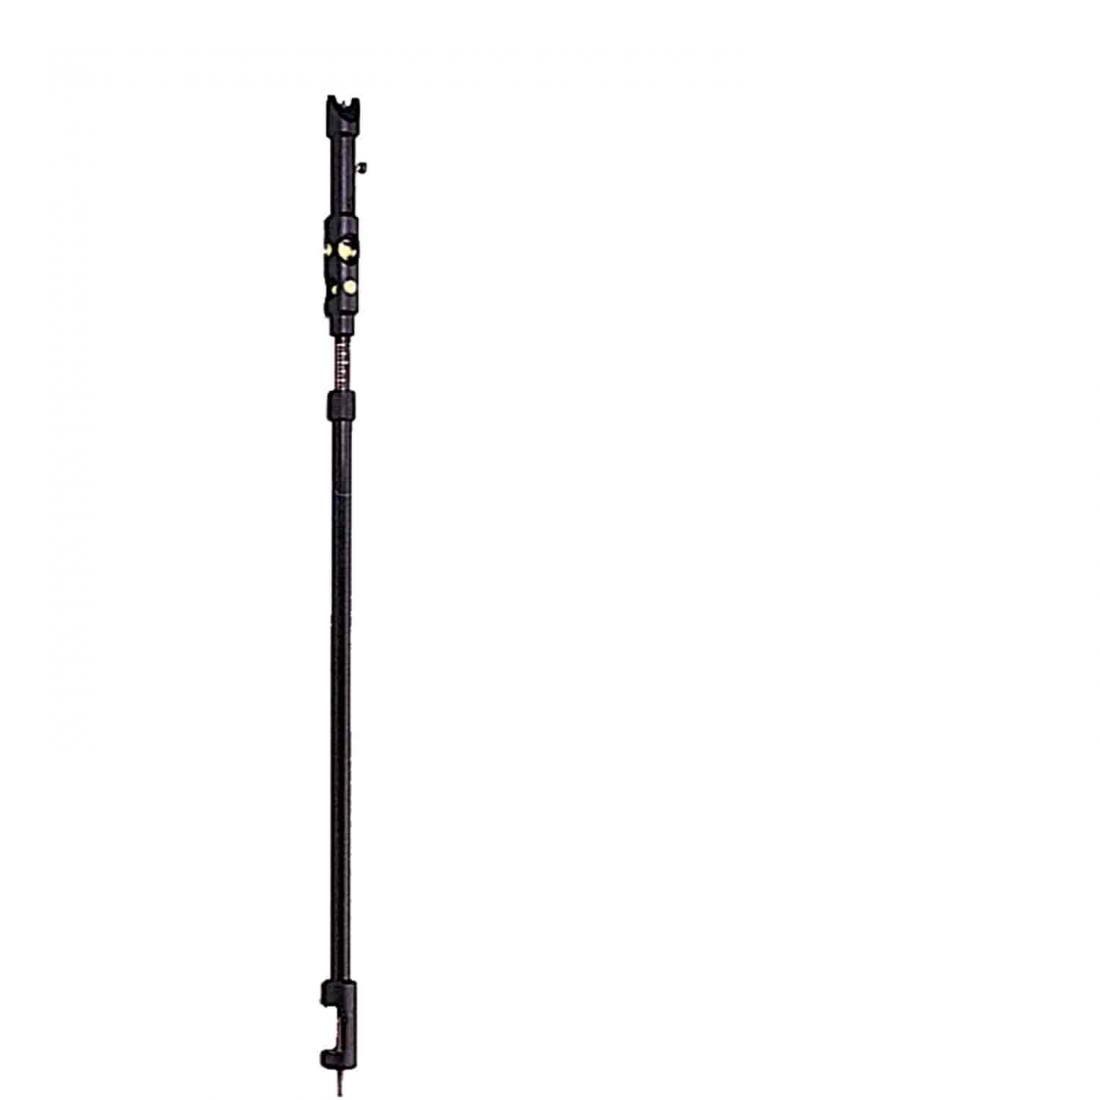 Best Lj 3047 Telescoping Baluster Marking Tool For Wood 400 x 300